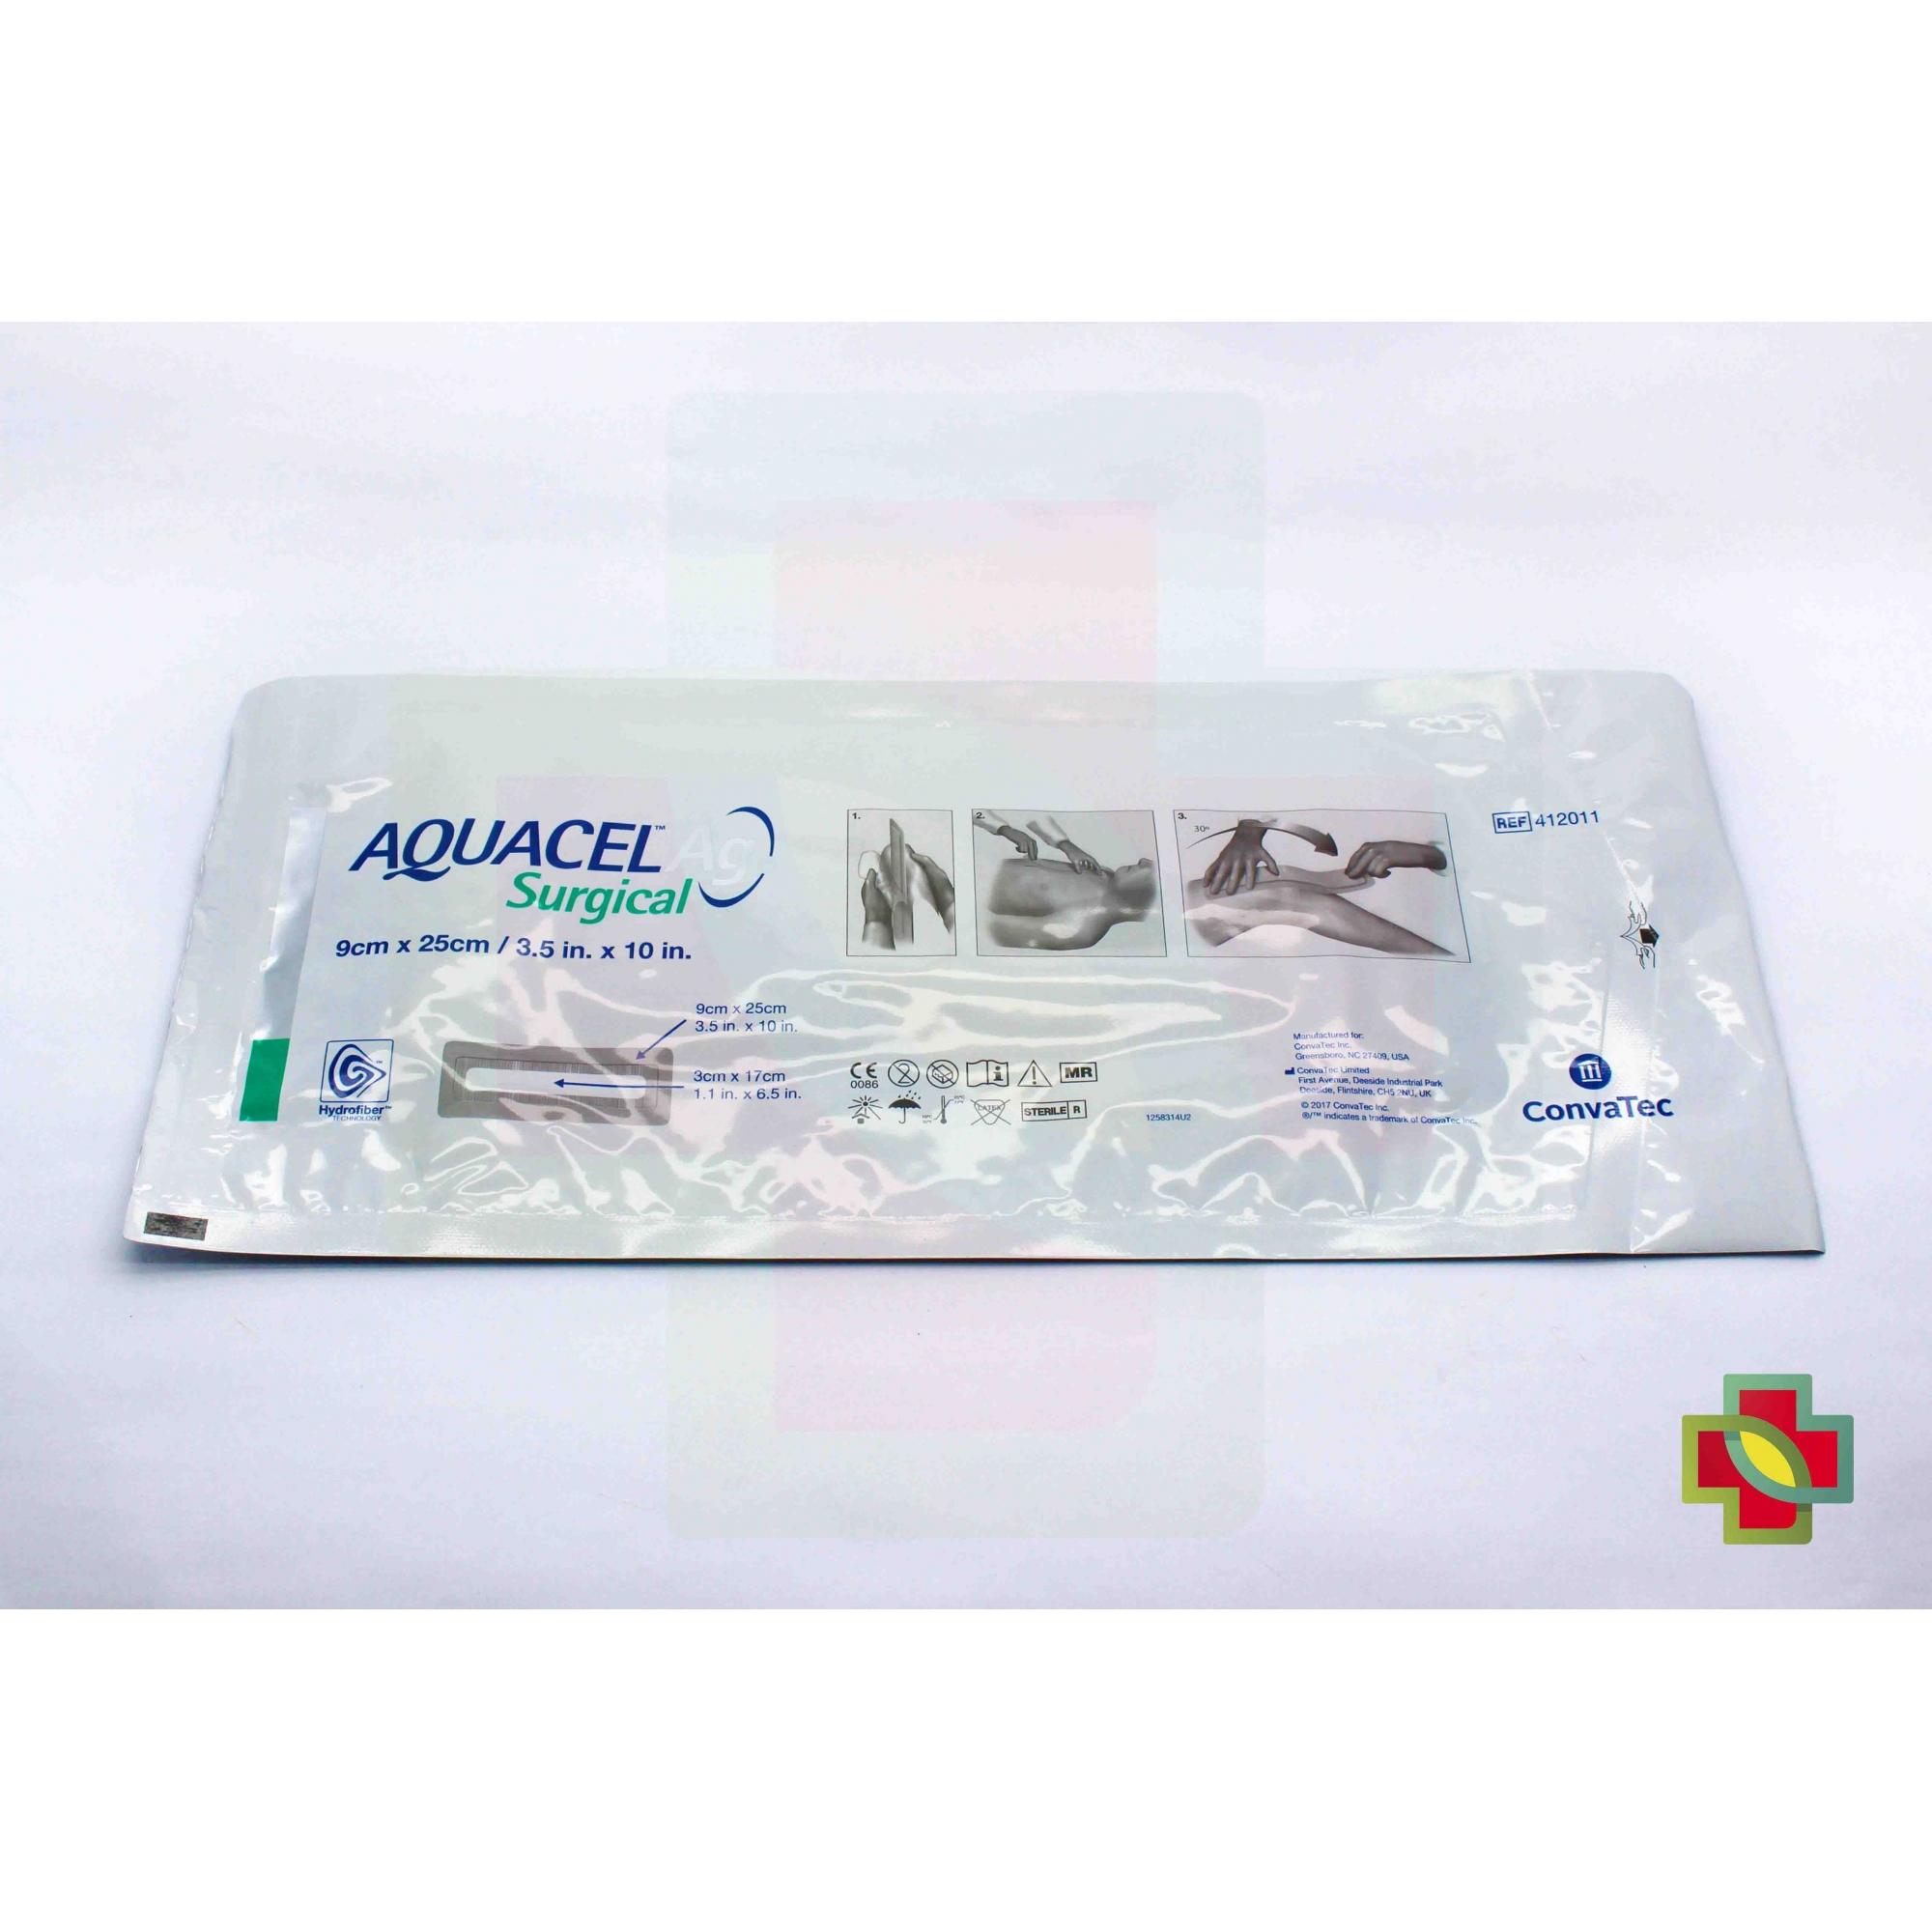 CURATIVO AGUACEL AG SURGICAL 09 X 25 UND 412011 - CONVATEC